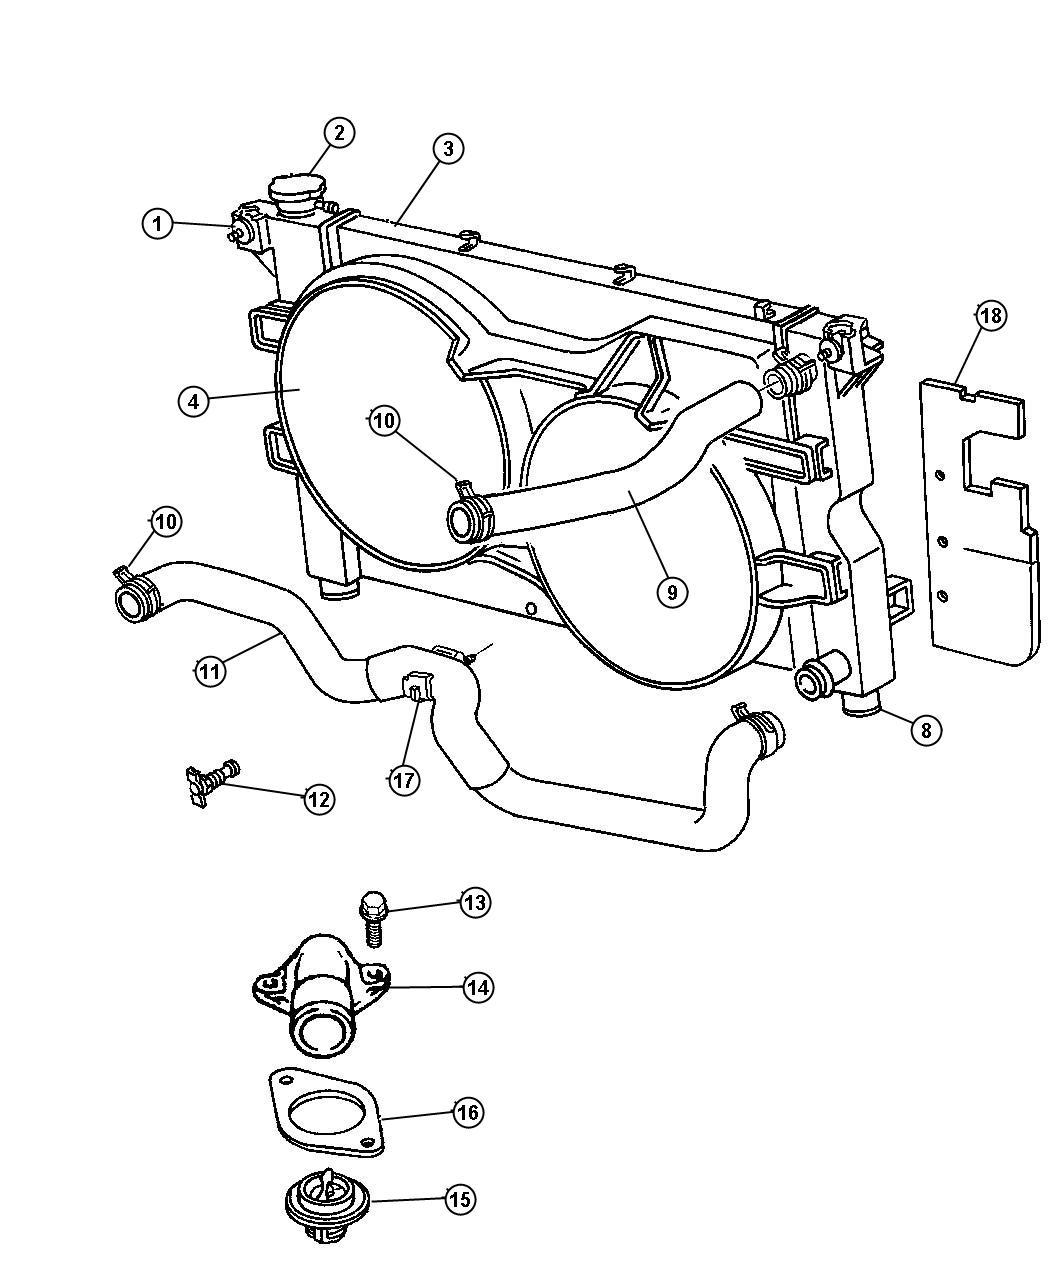 Chrysler Grand Voyager Clamp Hose Radiator 46x15 Lower